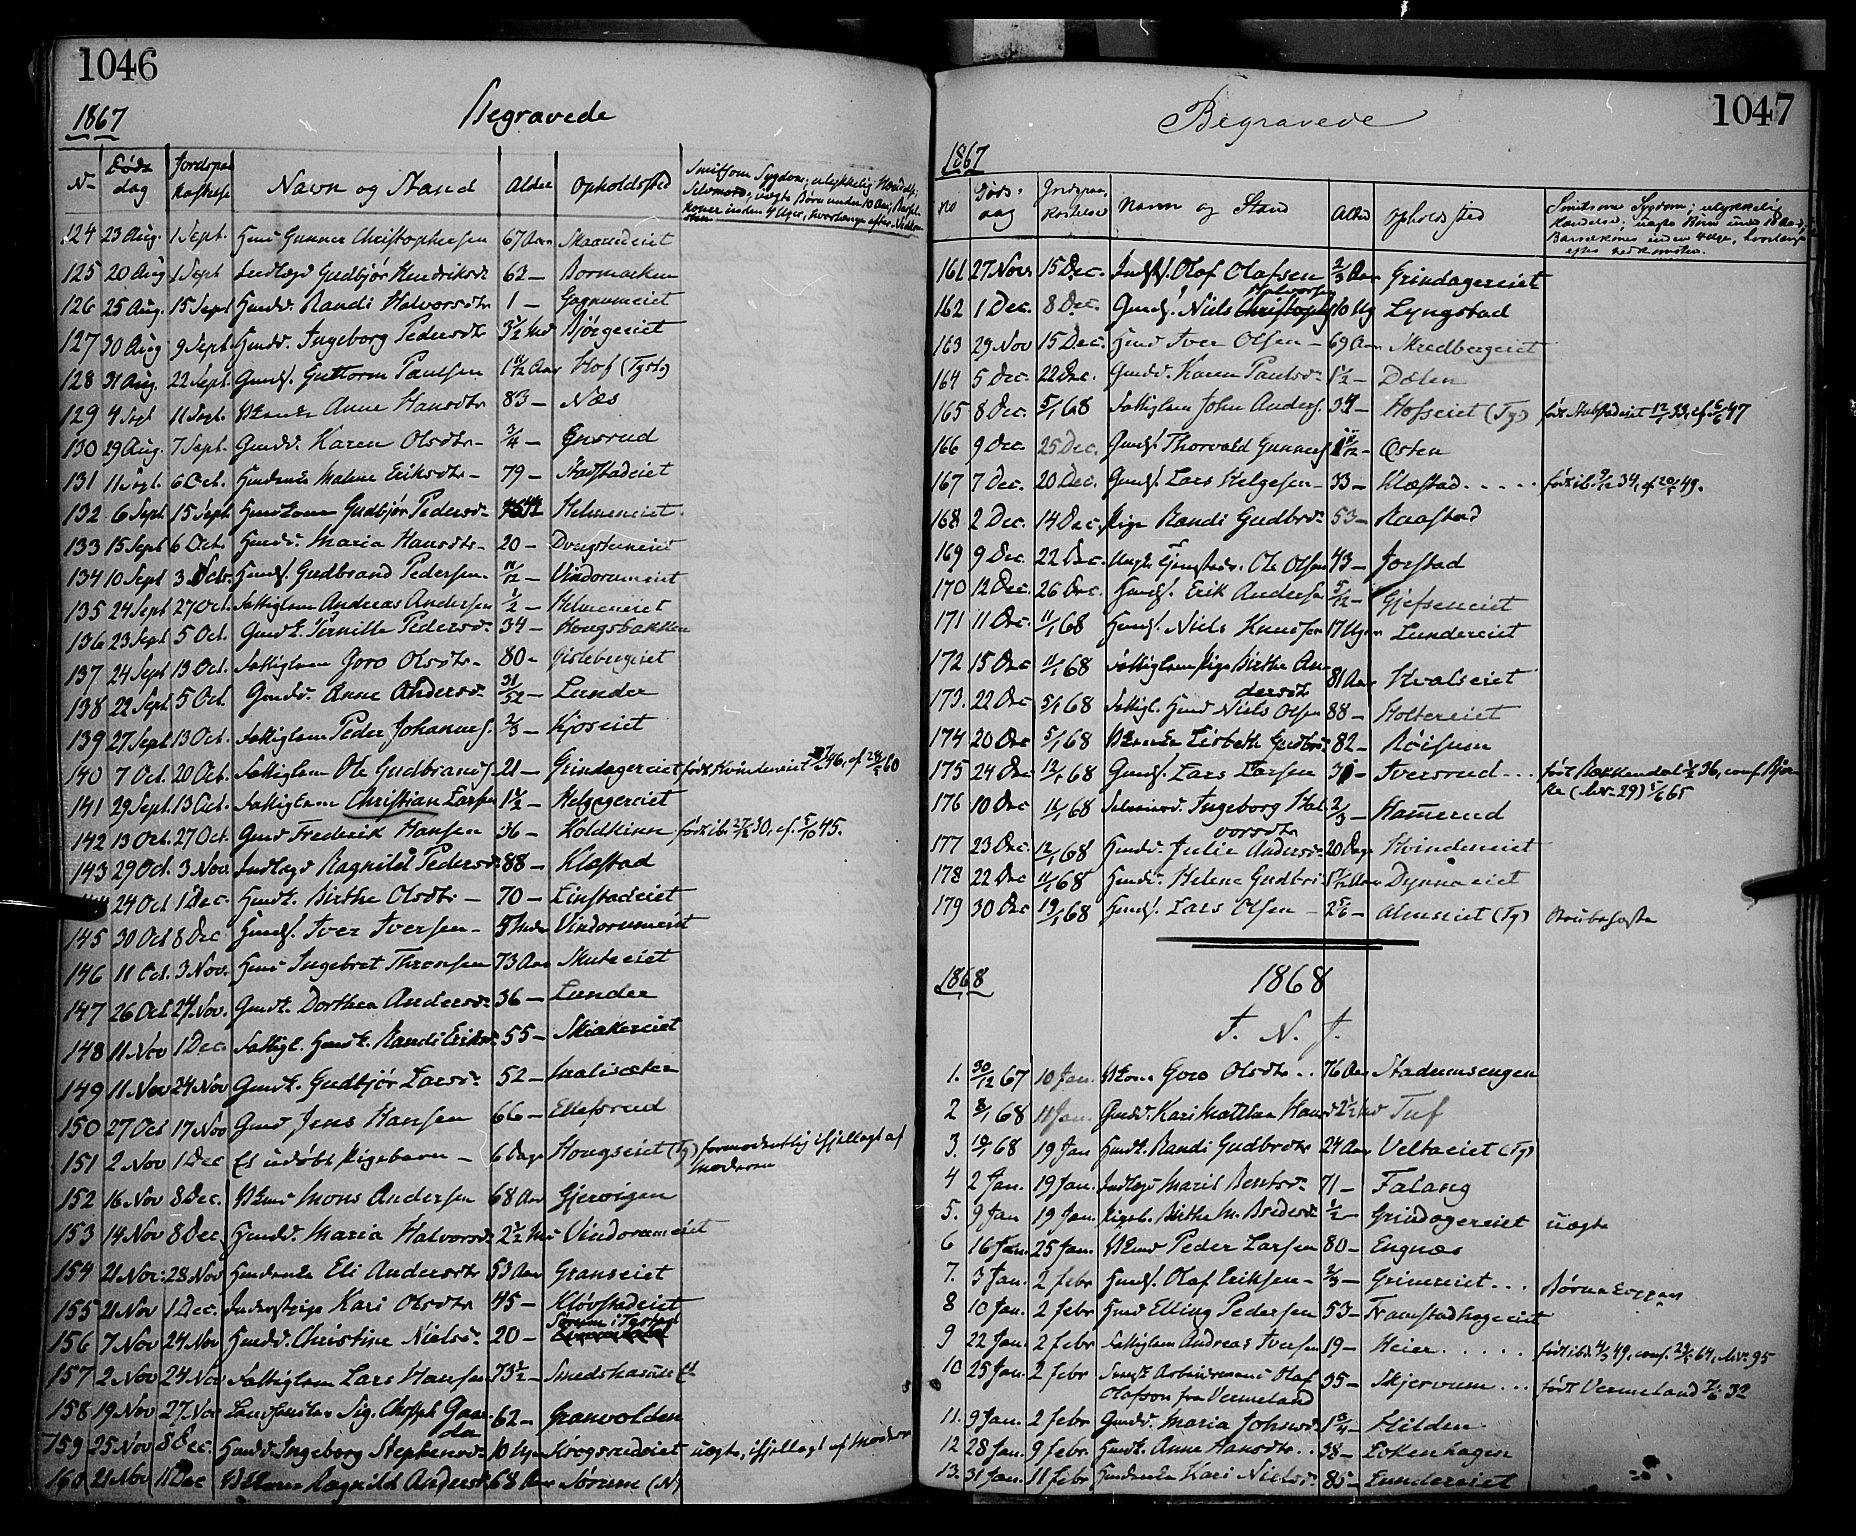 SAH, Gran prestekontor, Ministerialbok nr. 12, 1856-1874, s. 1046-1047